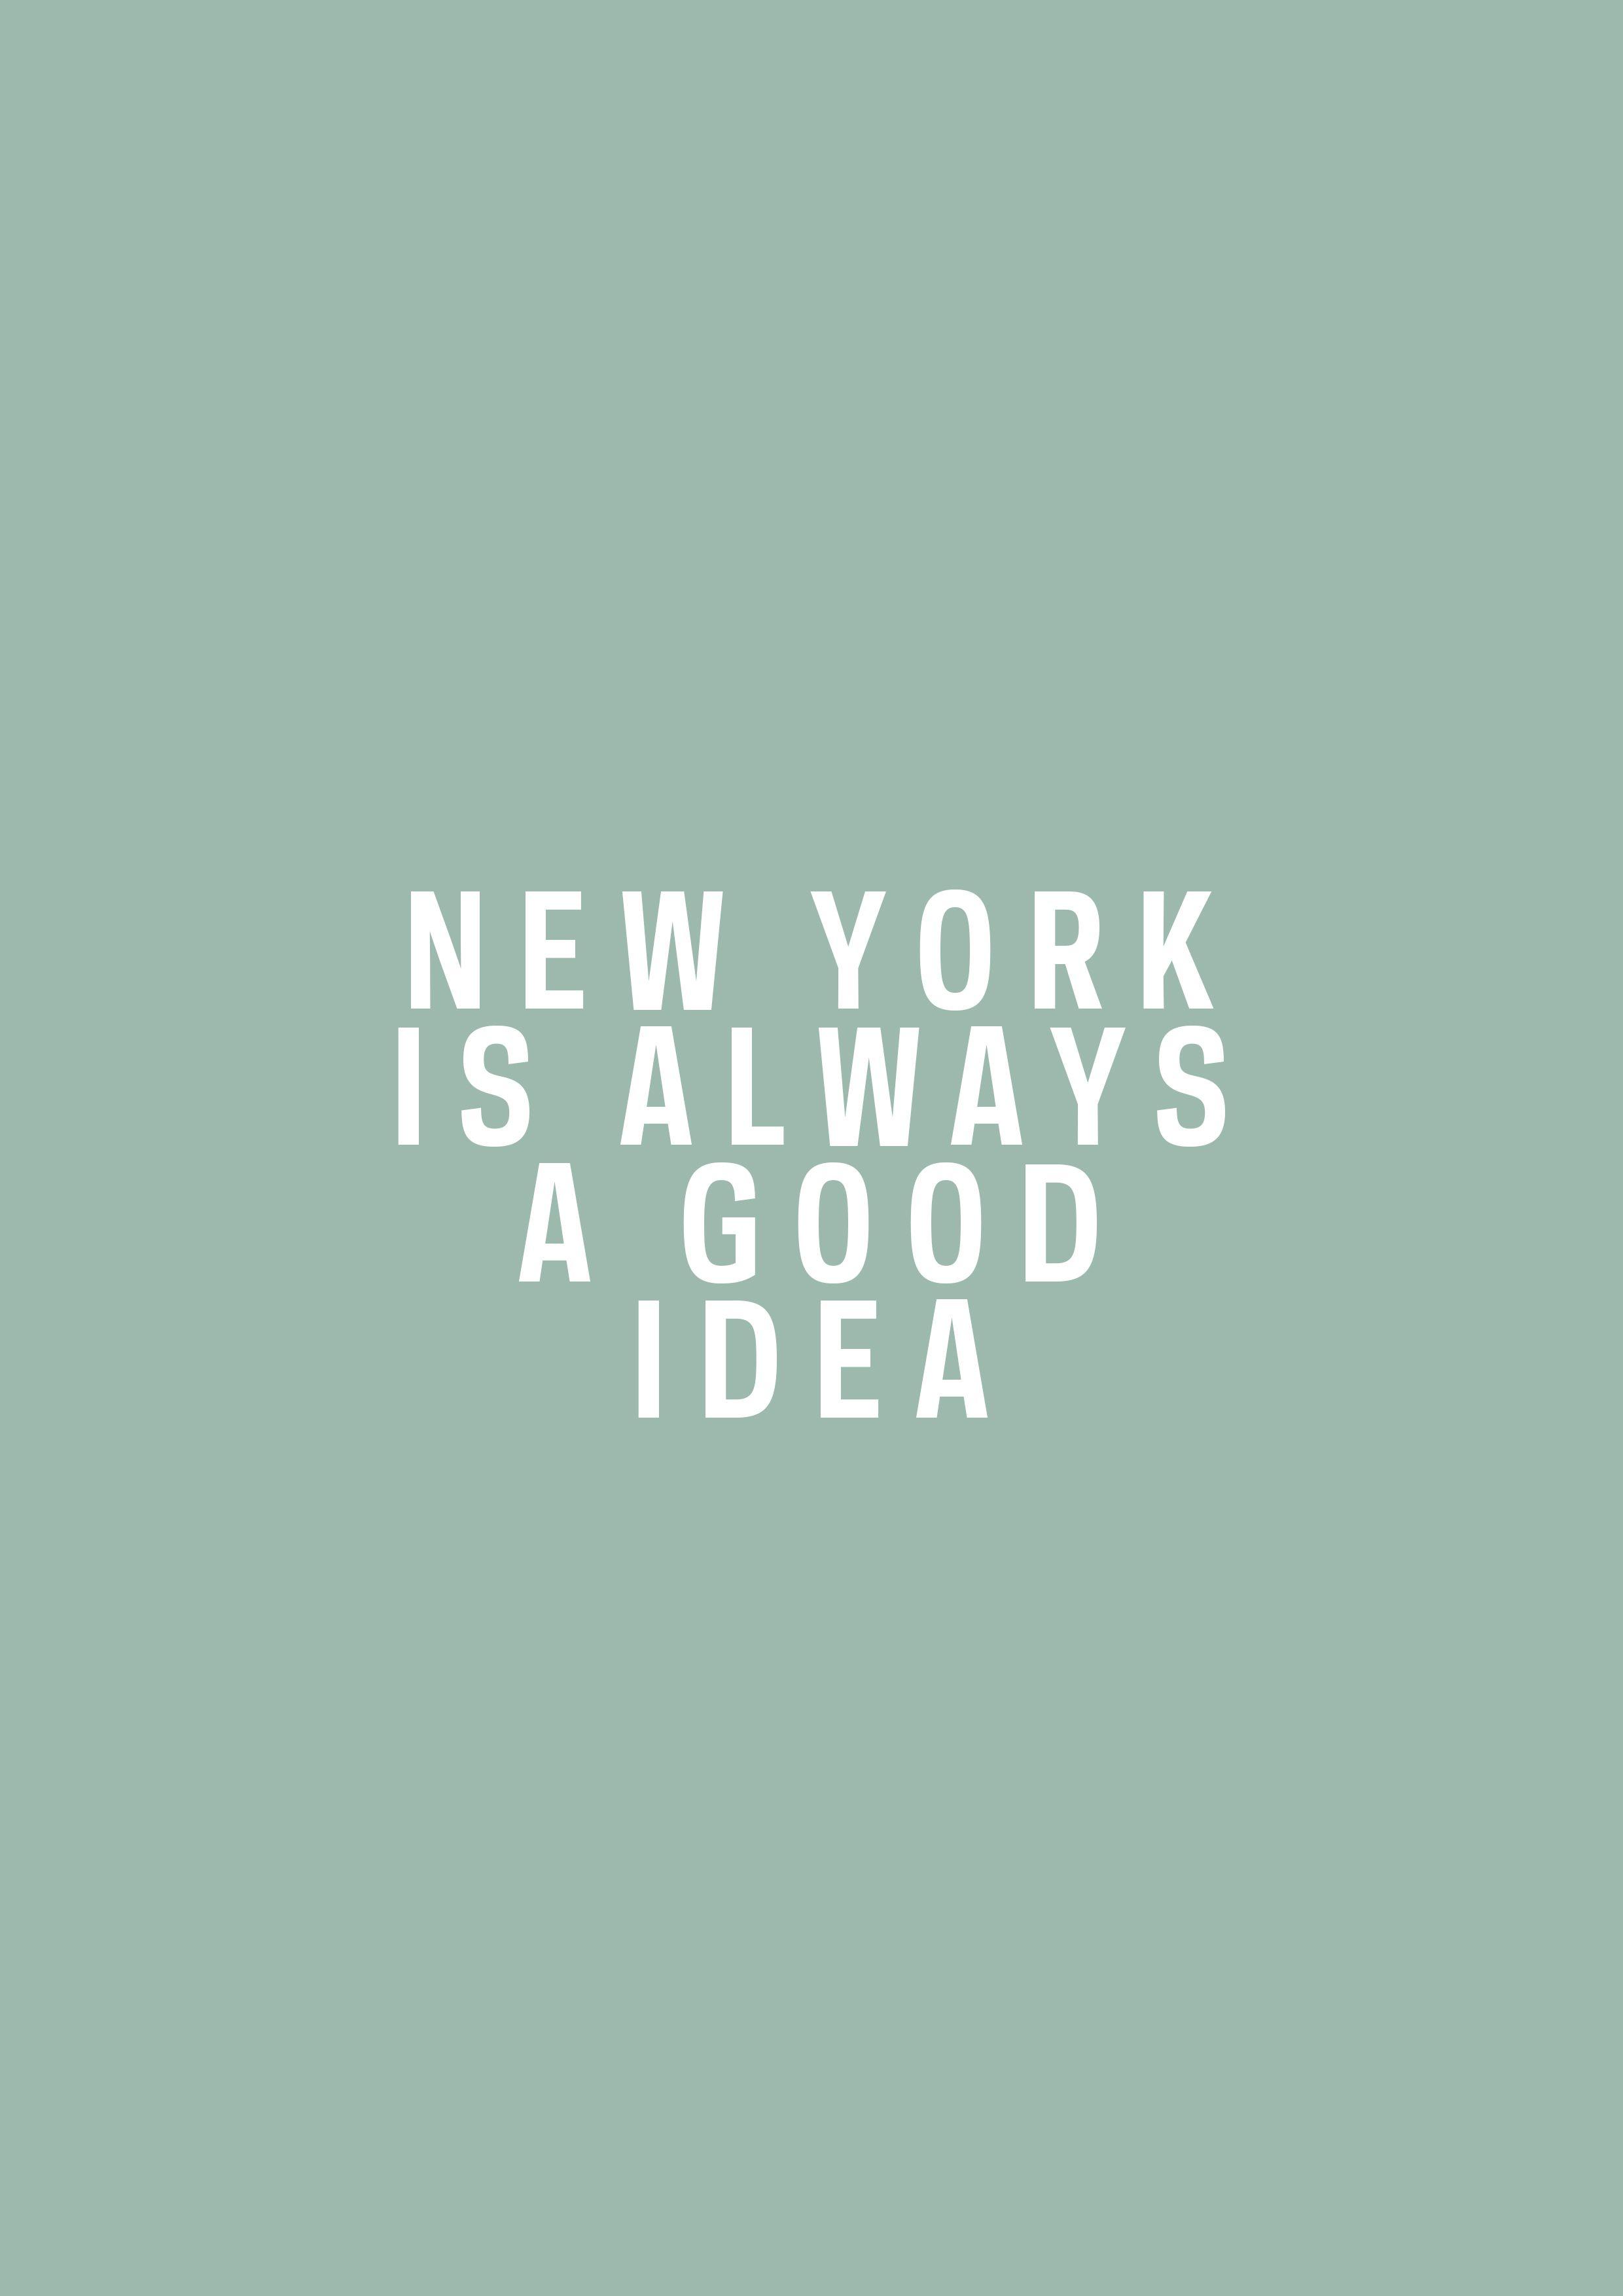 NYC is always a good idea. | NEW YORK | Good selfie captions ...